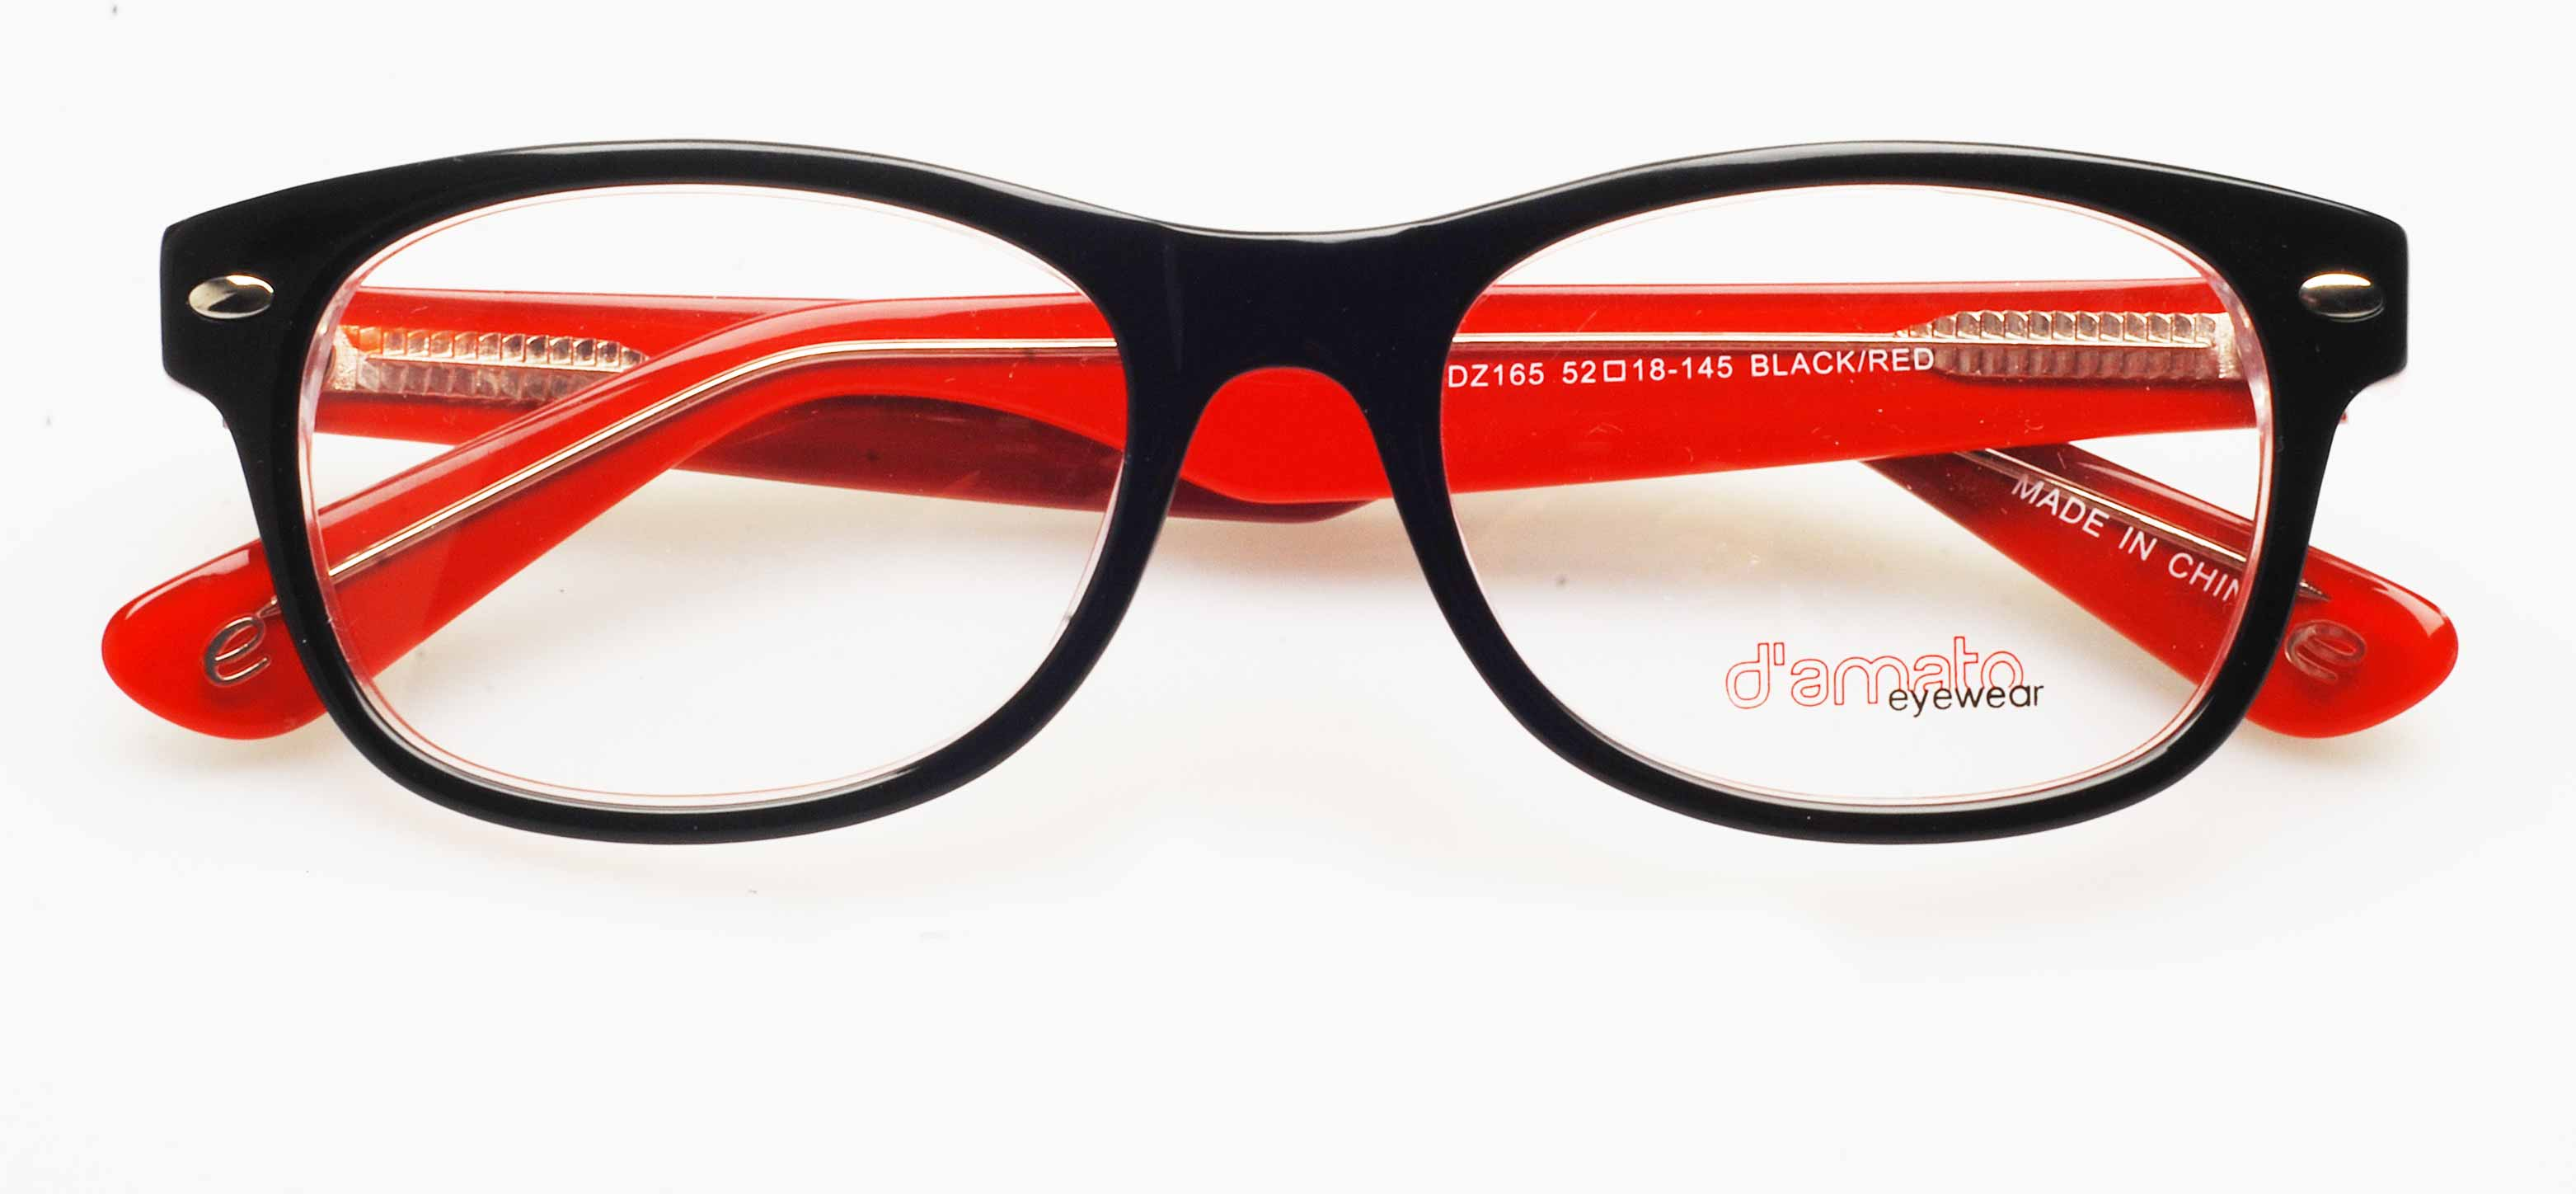 dz165 new trends eyewear